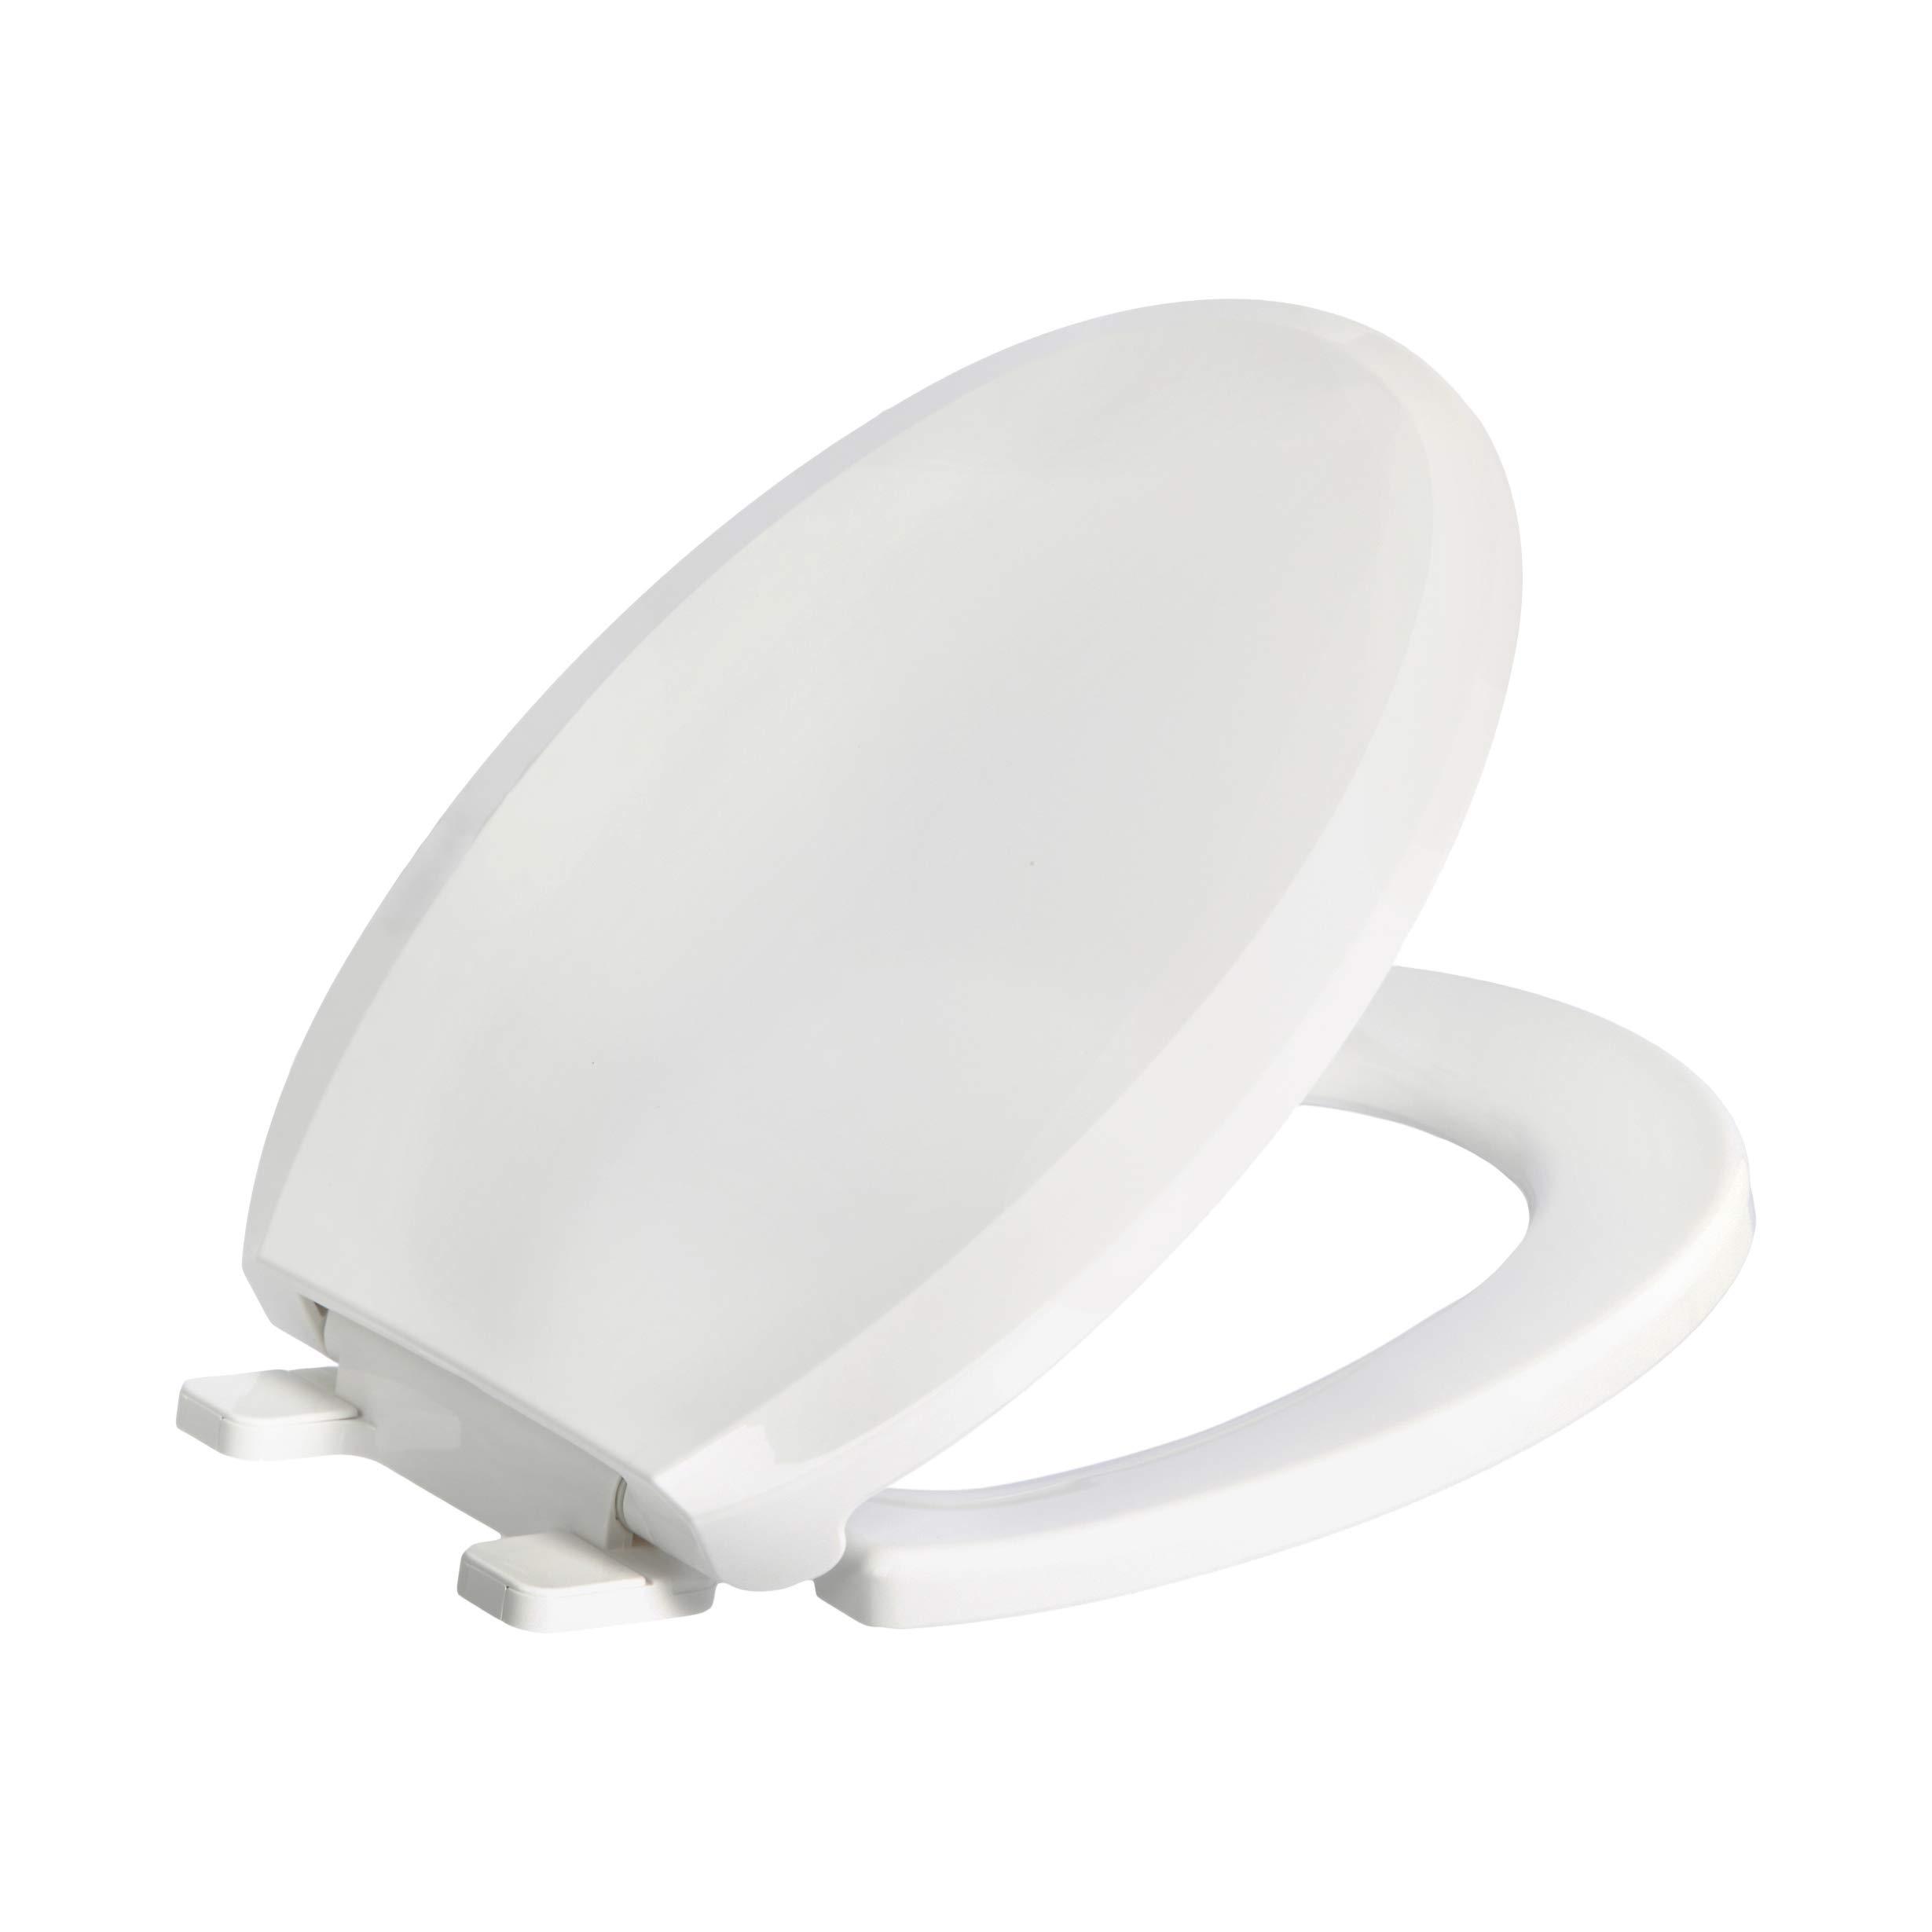 AmazonBasics AB-T101-R-W Soft-Close Toilet Seat, Round, White, 1-Pack